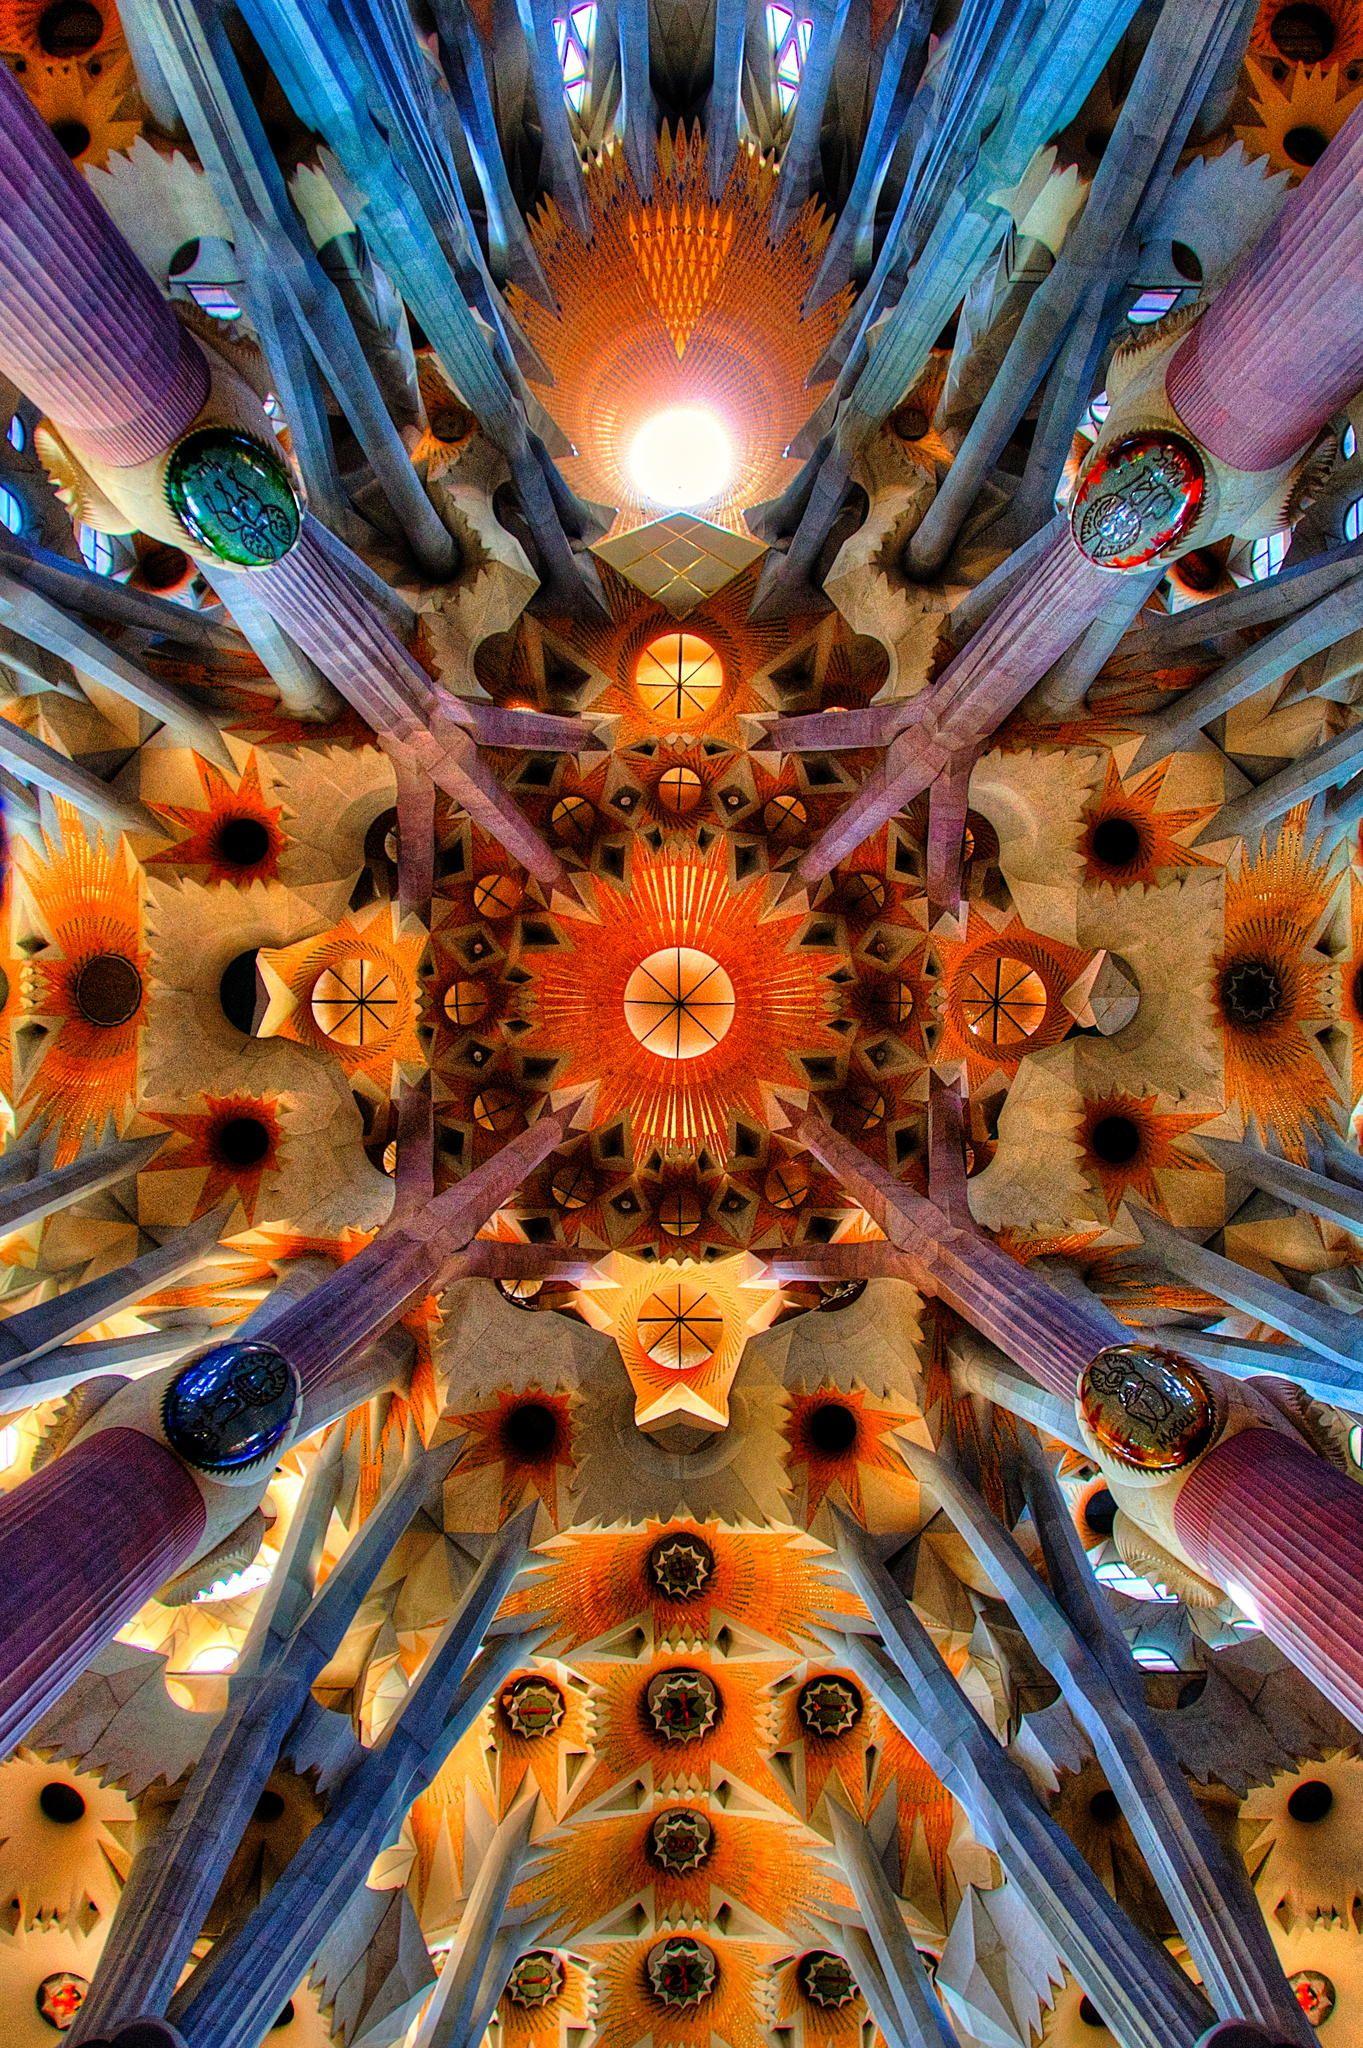 La Sagrada Familia. Antoni Gaudi. Barcelona, Spain. Gaudi started project in 1883 and it is still under construction. Estimated completion 2026.